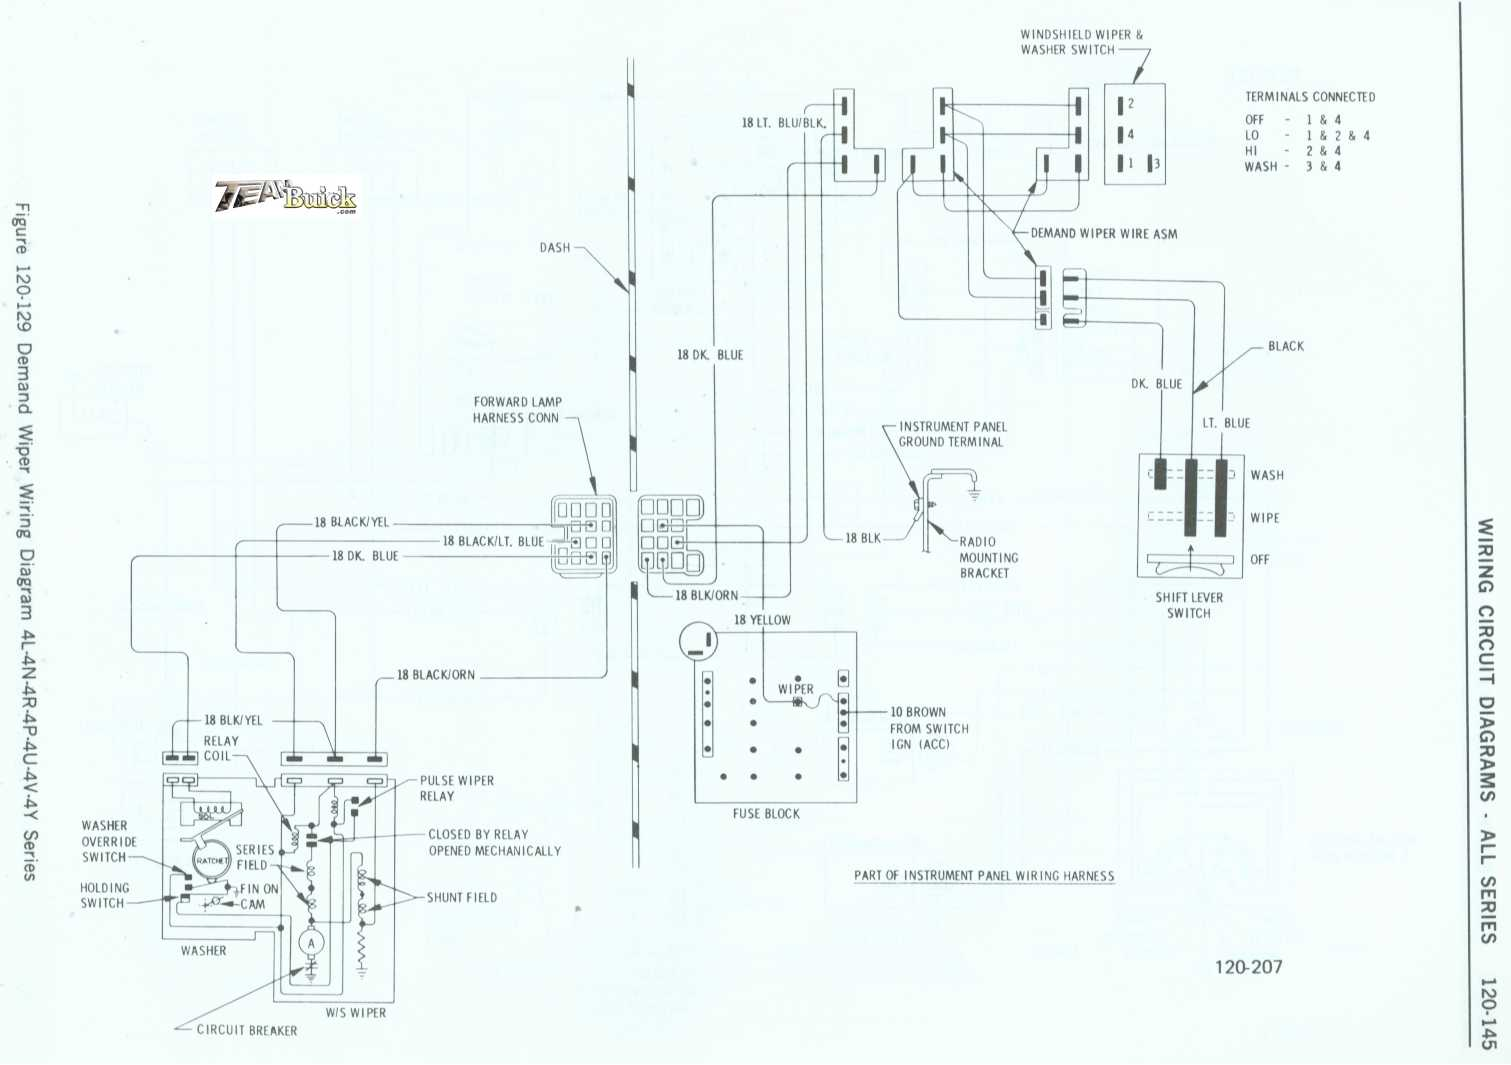 1972 Buick, Demand Wiper Wiring Diagram 4L-4N-4R-4P-4U-4V